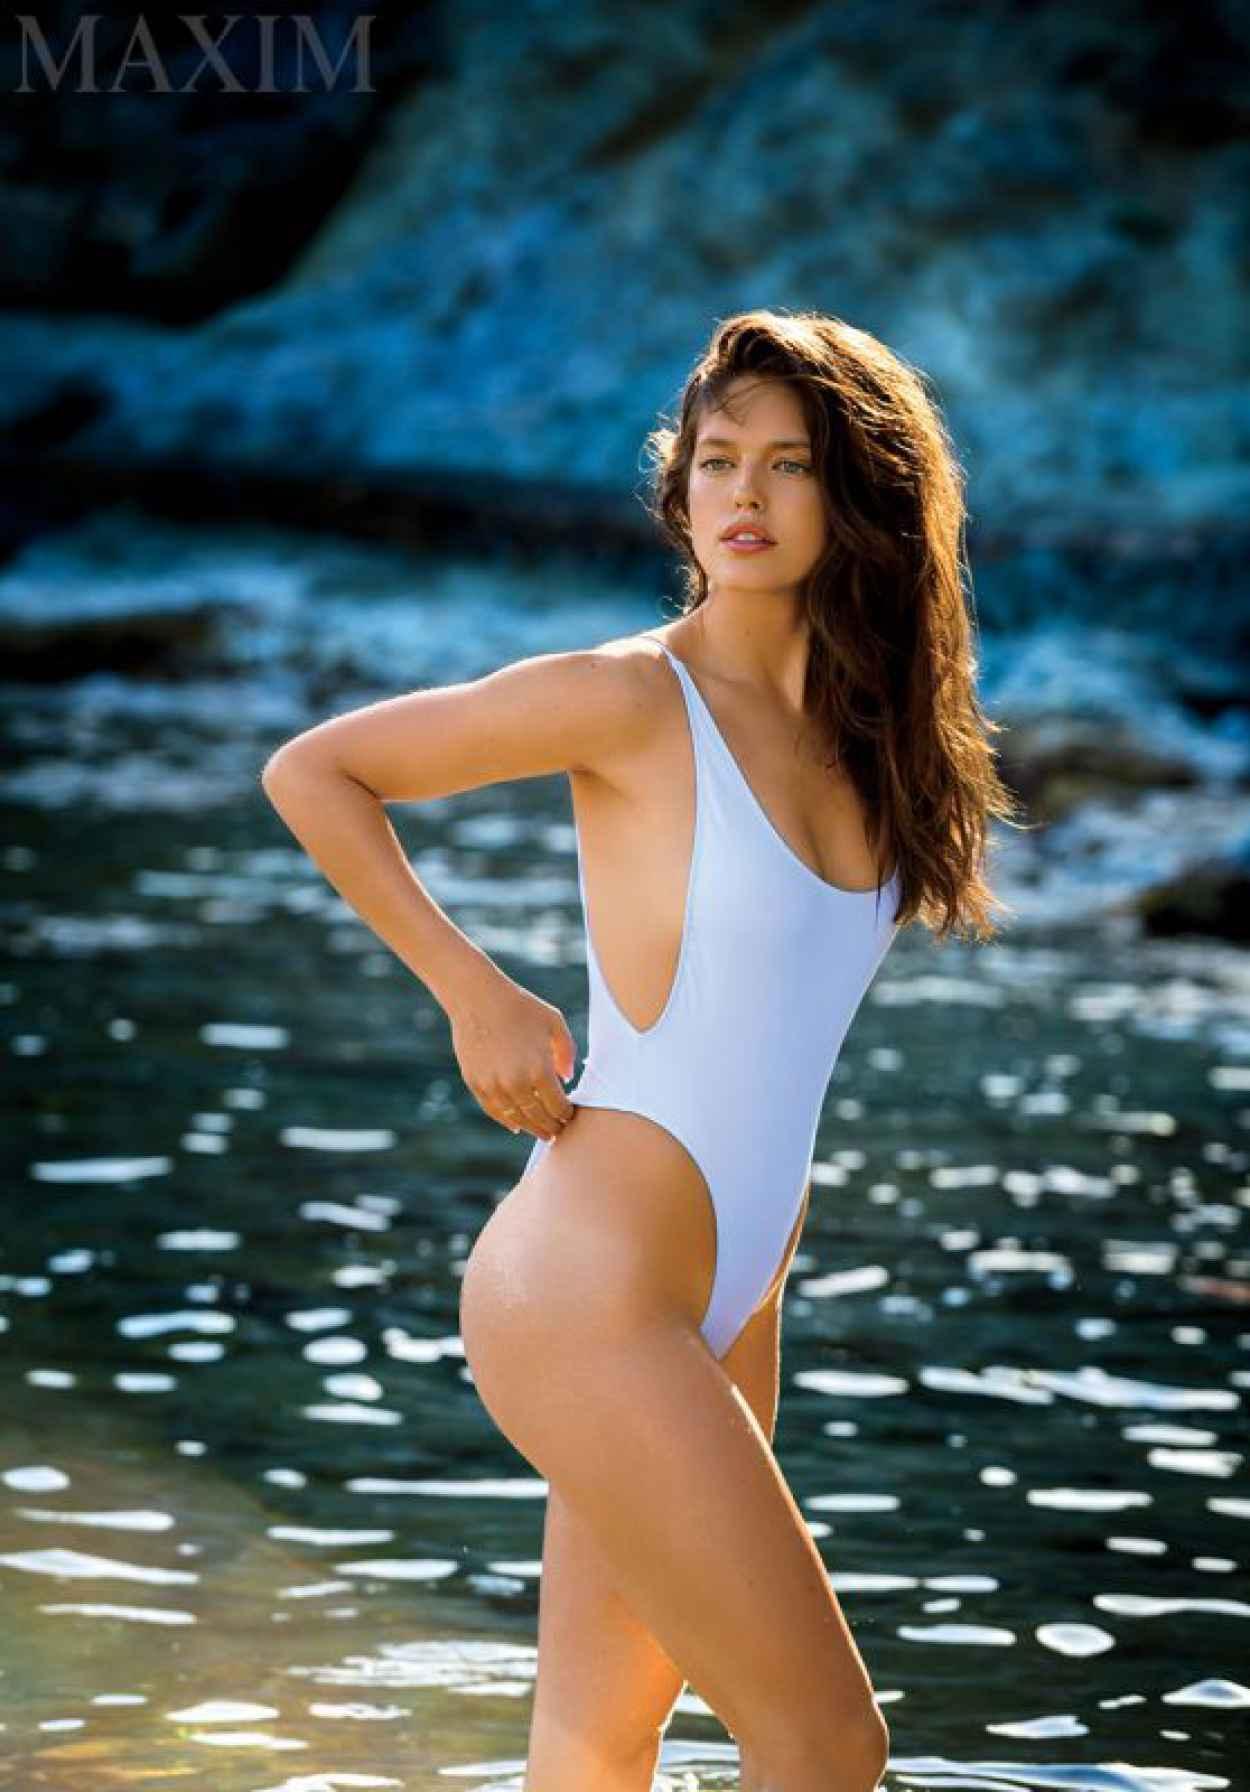 Emily Didonato - Maxim Magazine - August 2015 Issue-1